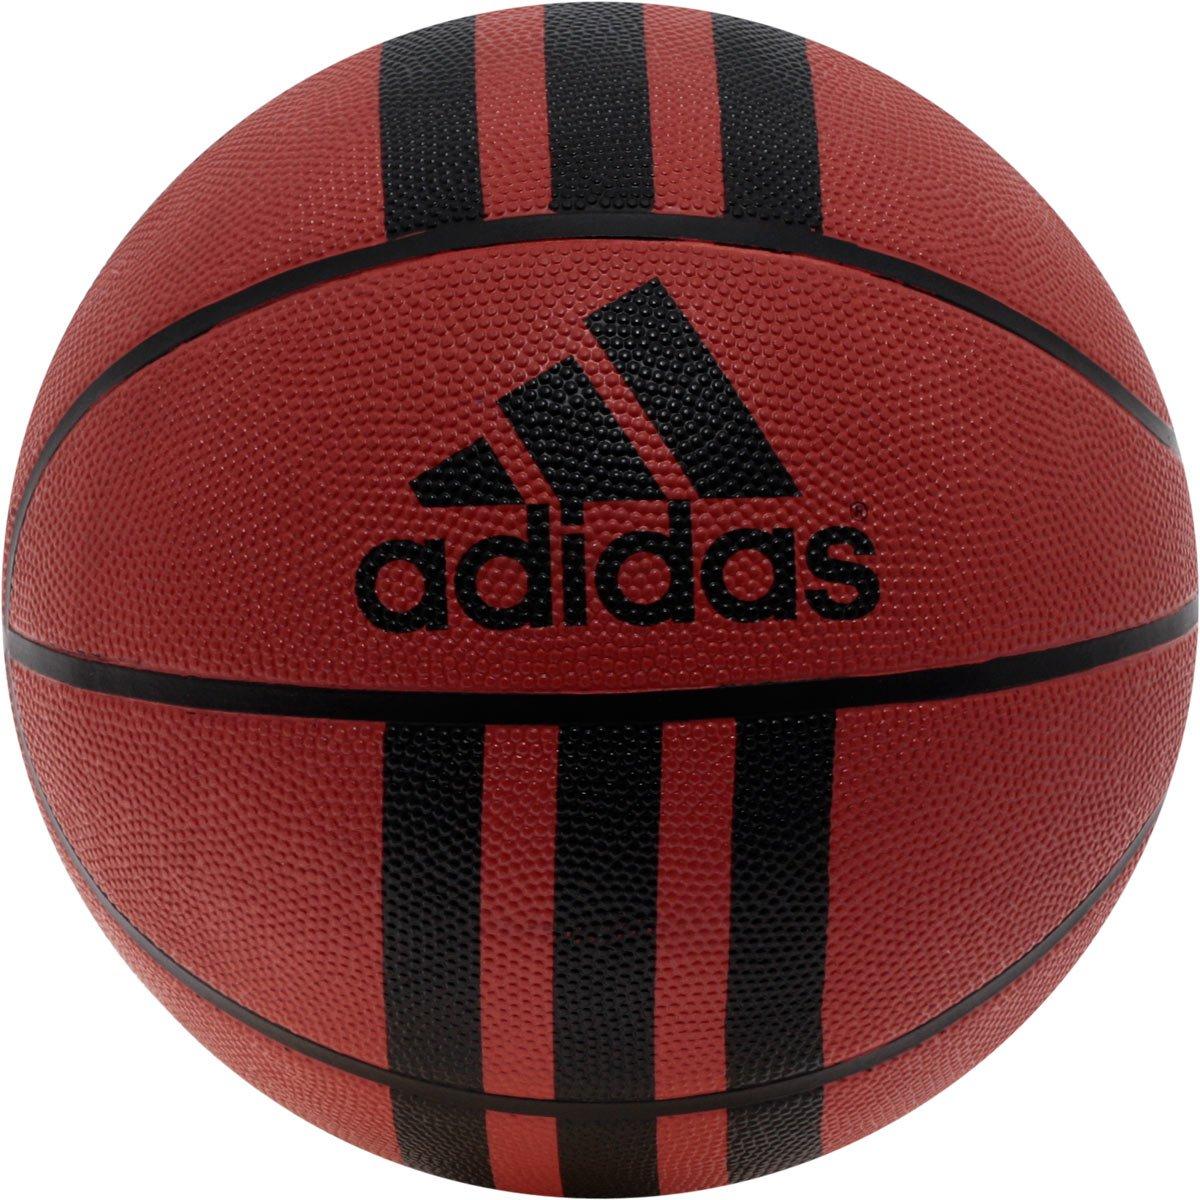 Bola Basquete Adidas 3 Stripe D29.5 91c176e17b3ca